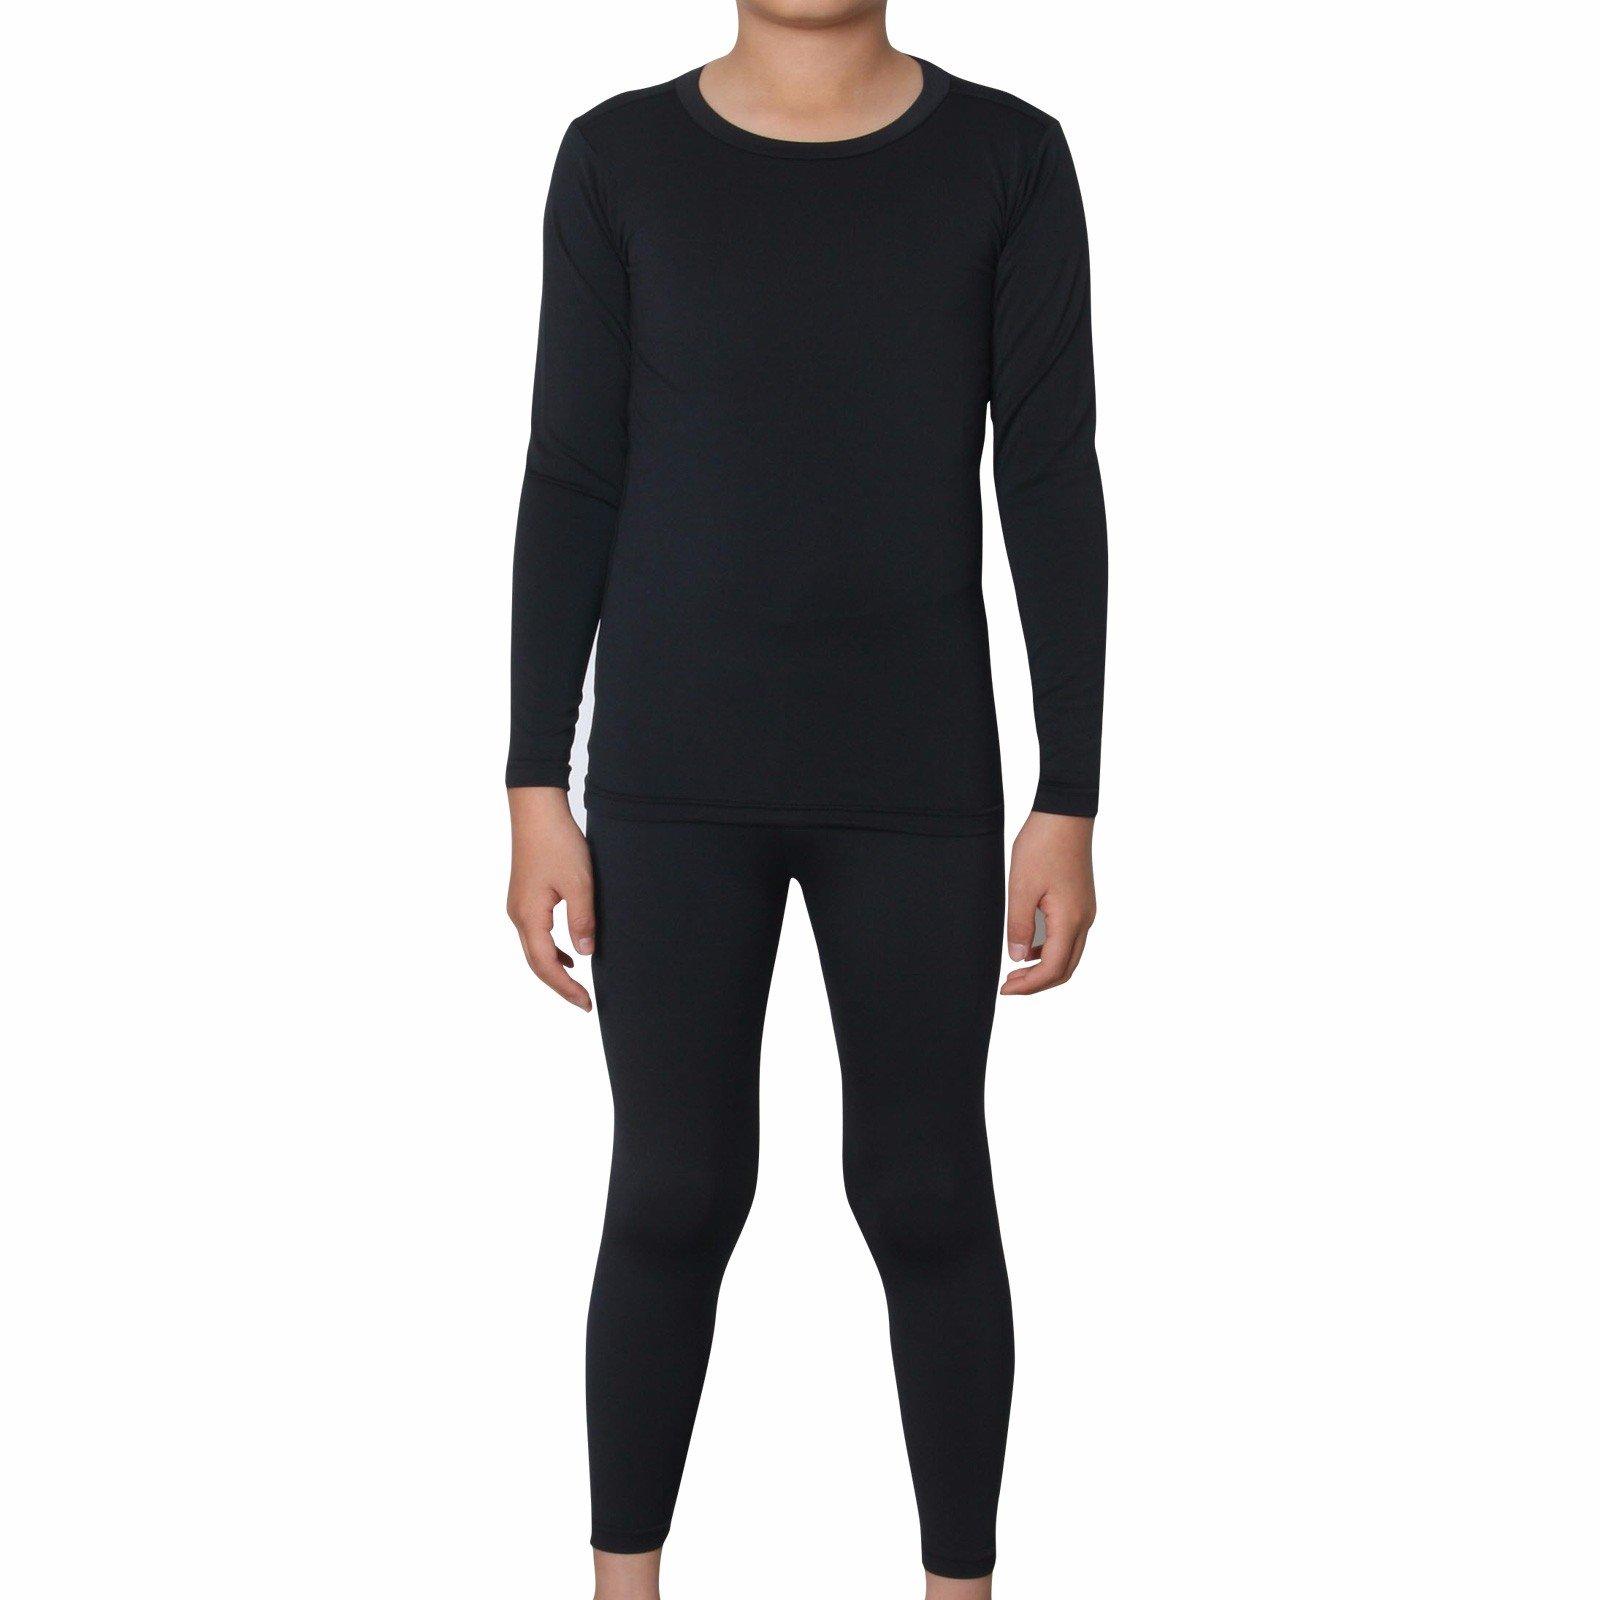 Thermal Underwear Kids Base Layer Compression Pants Shirt Tights Set CPLK L